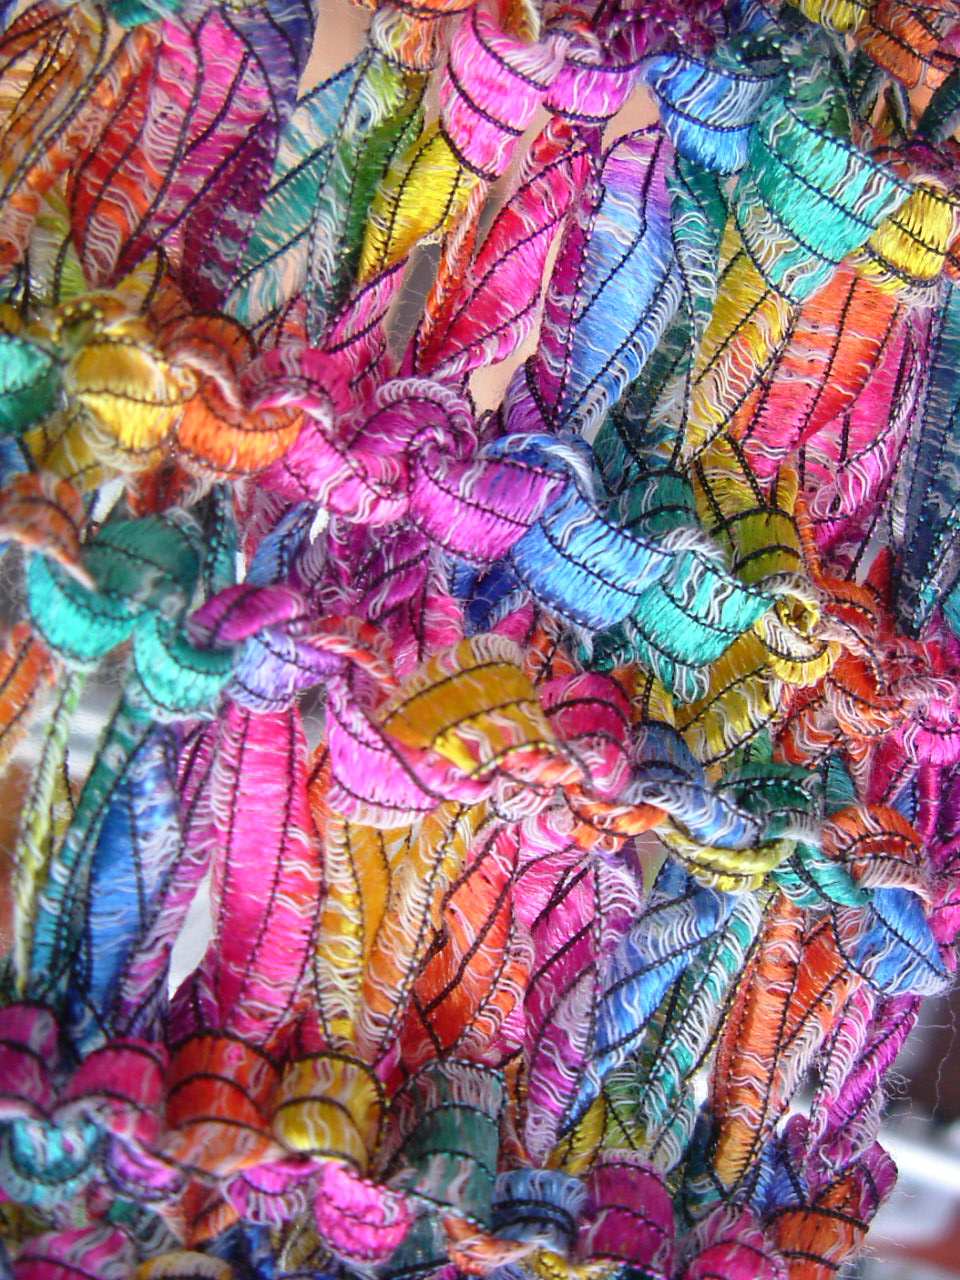 List All Knitting Stitches : List of knitting stitches